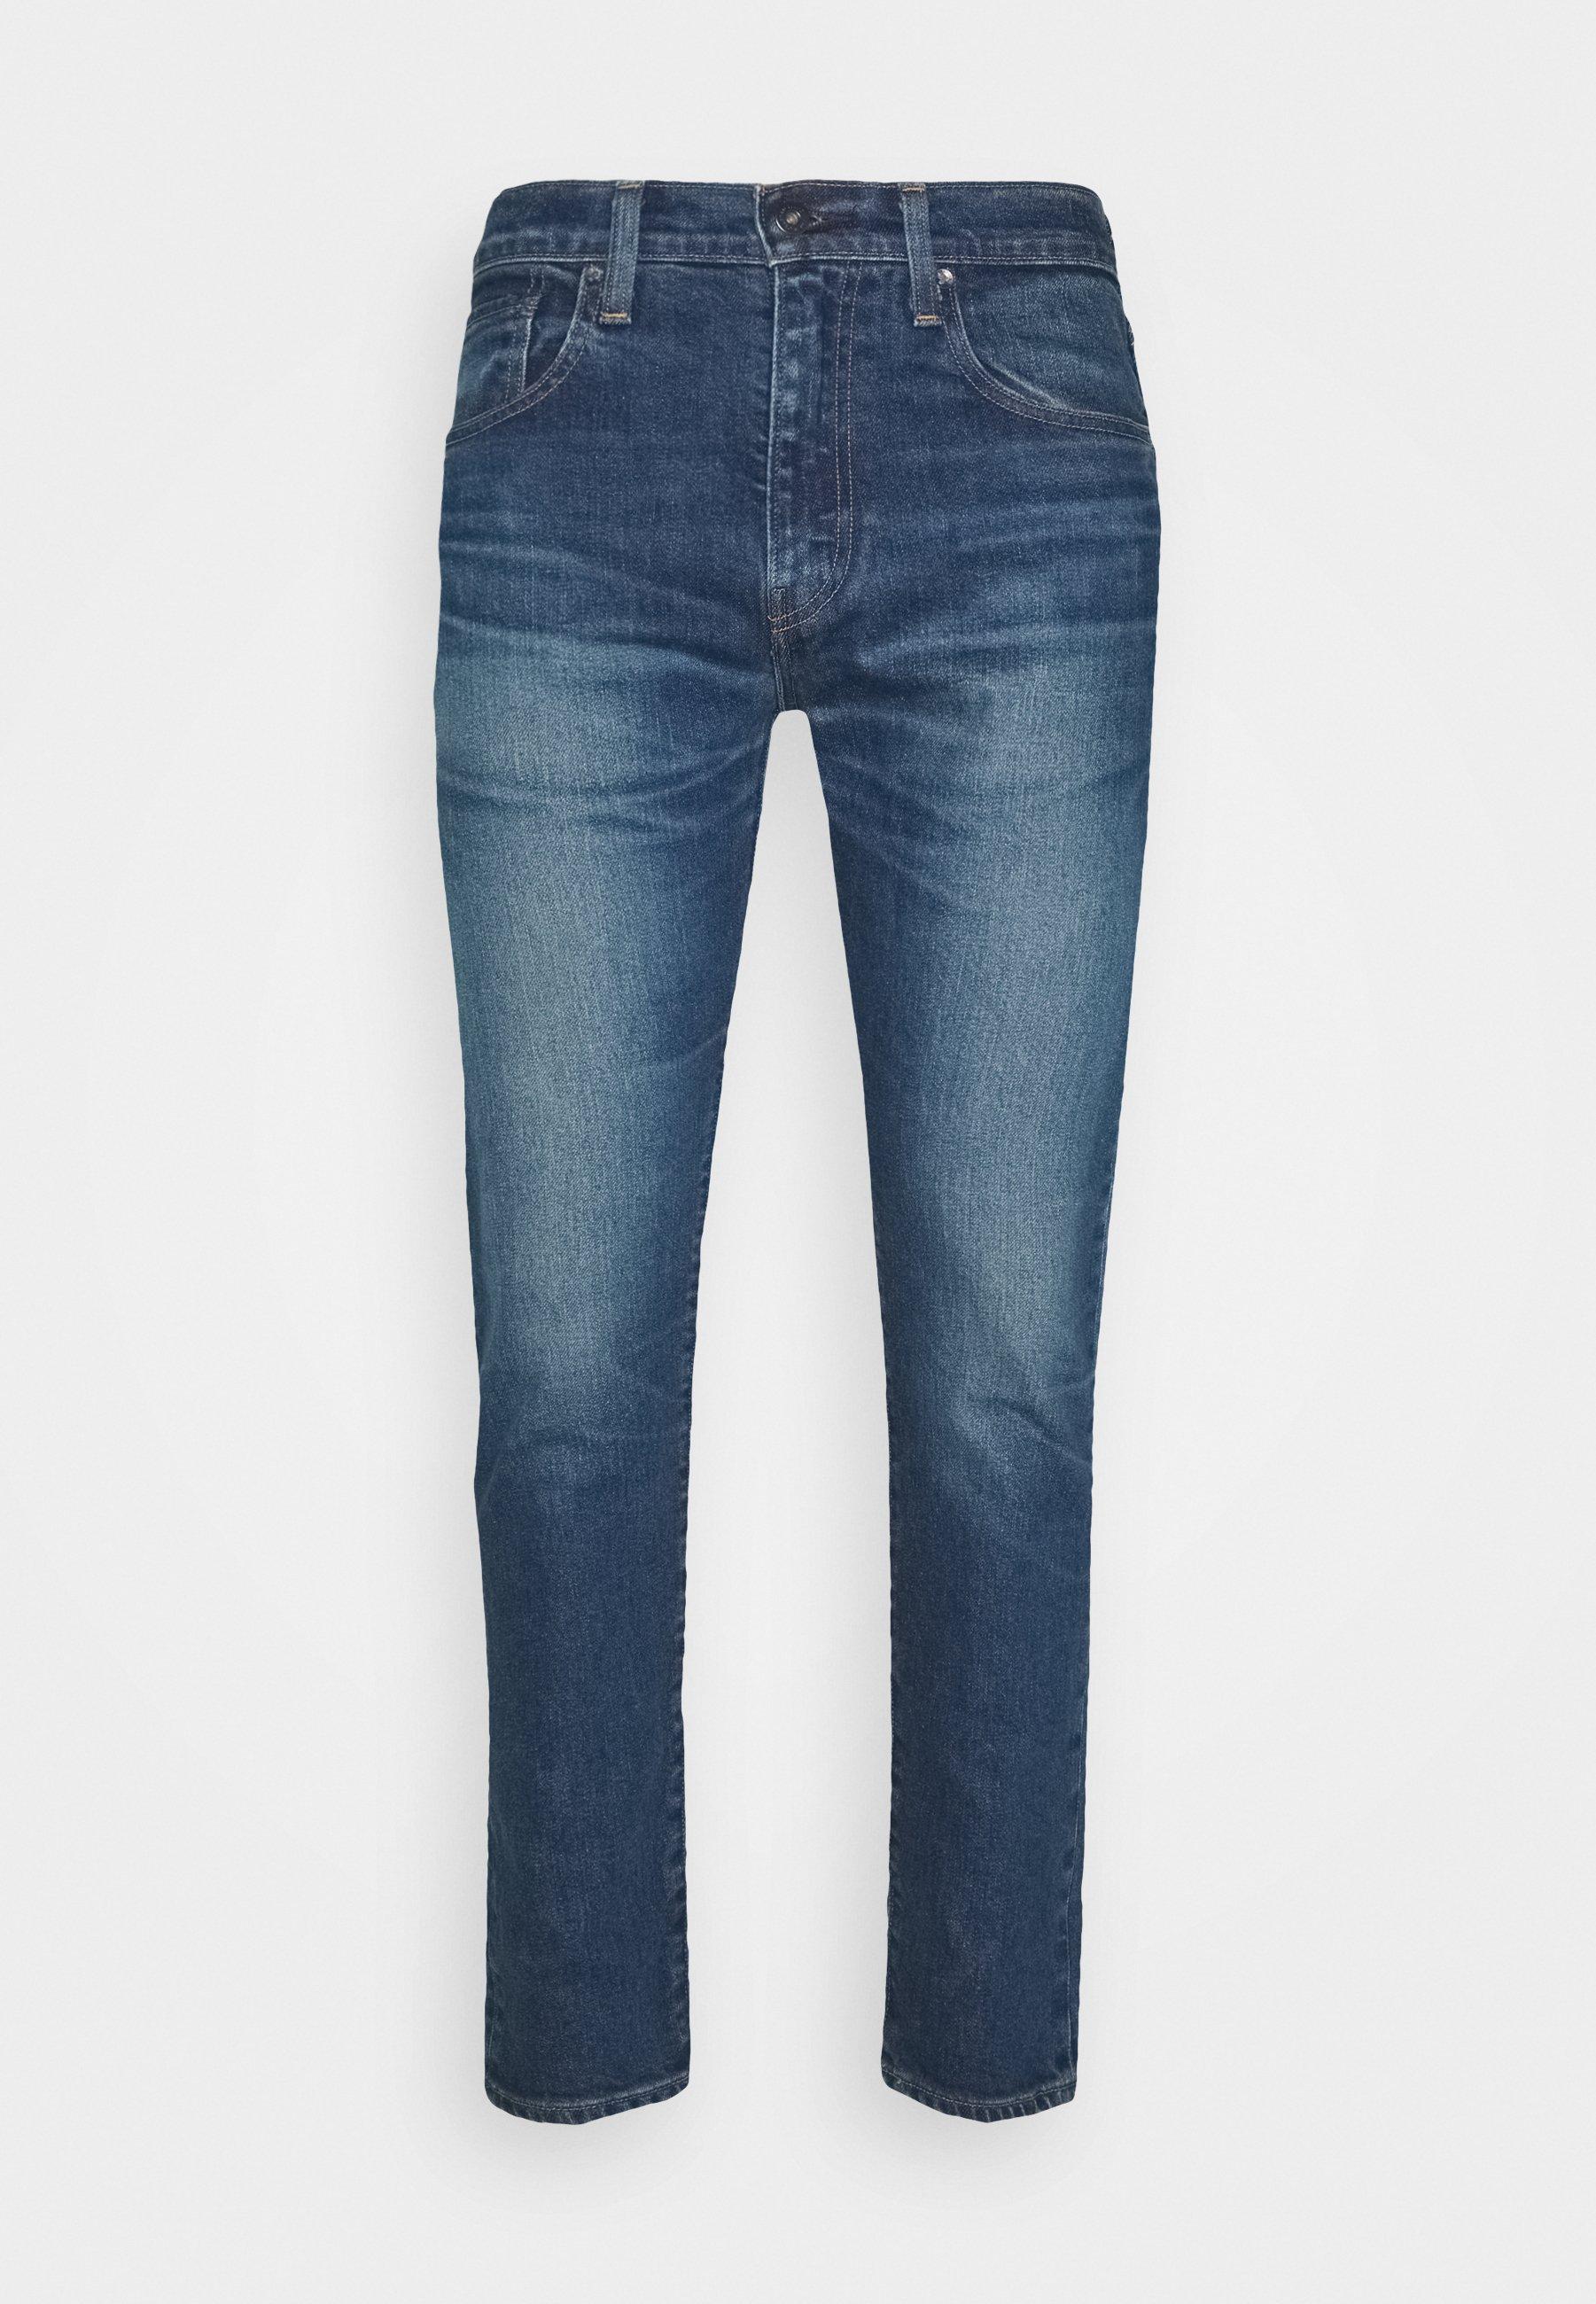 Levi's® Made & Crafted Lmc 512™ Slim Taper Fit - Jeans Niseko Mij